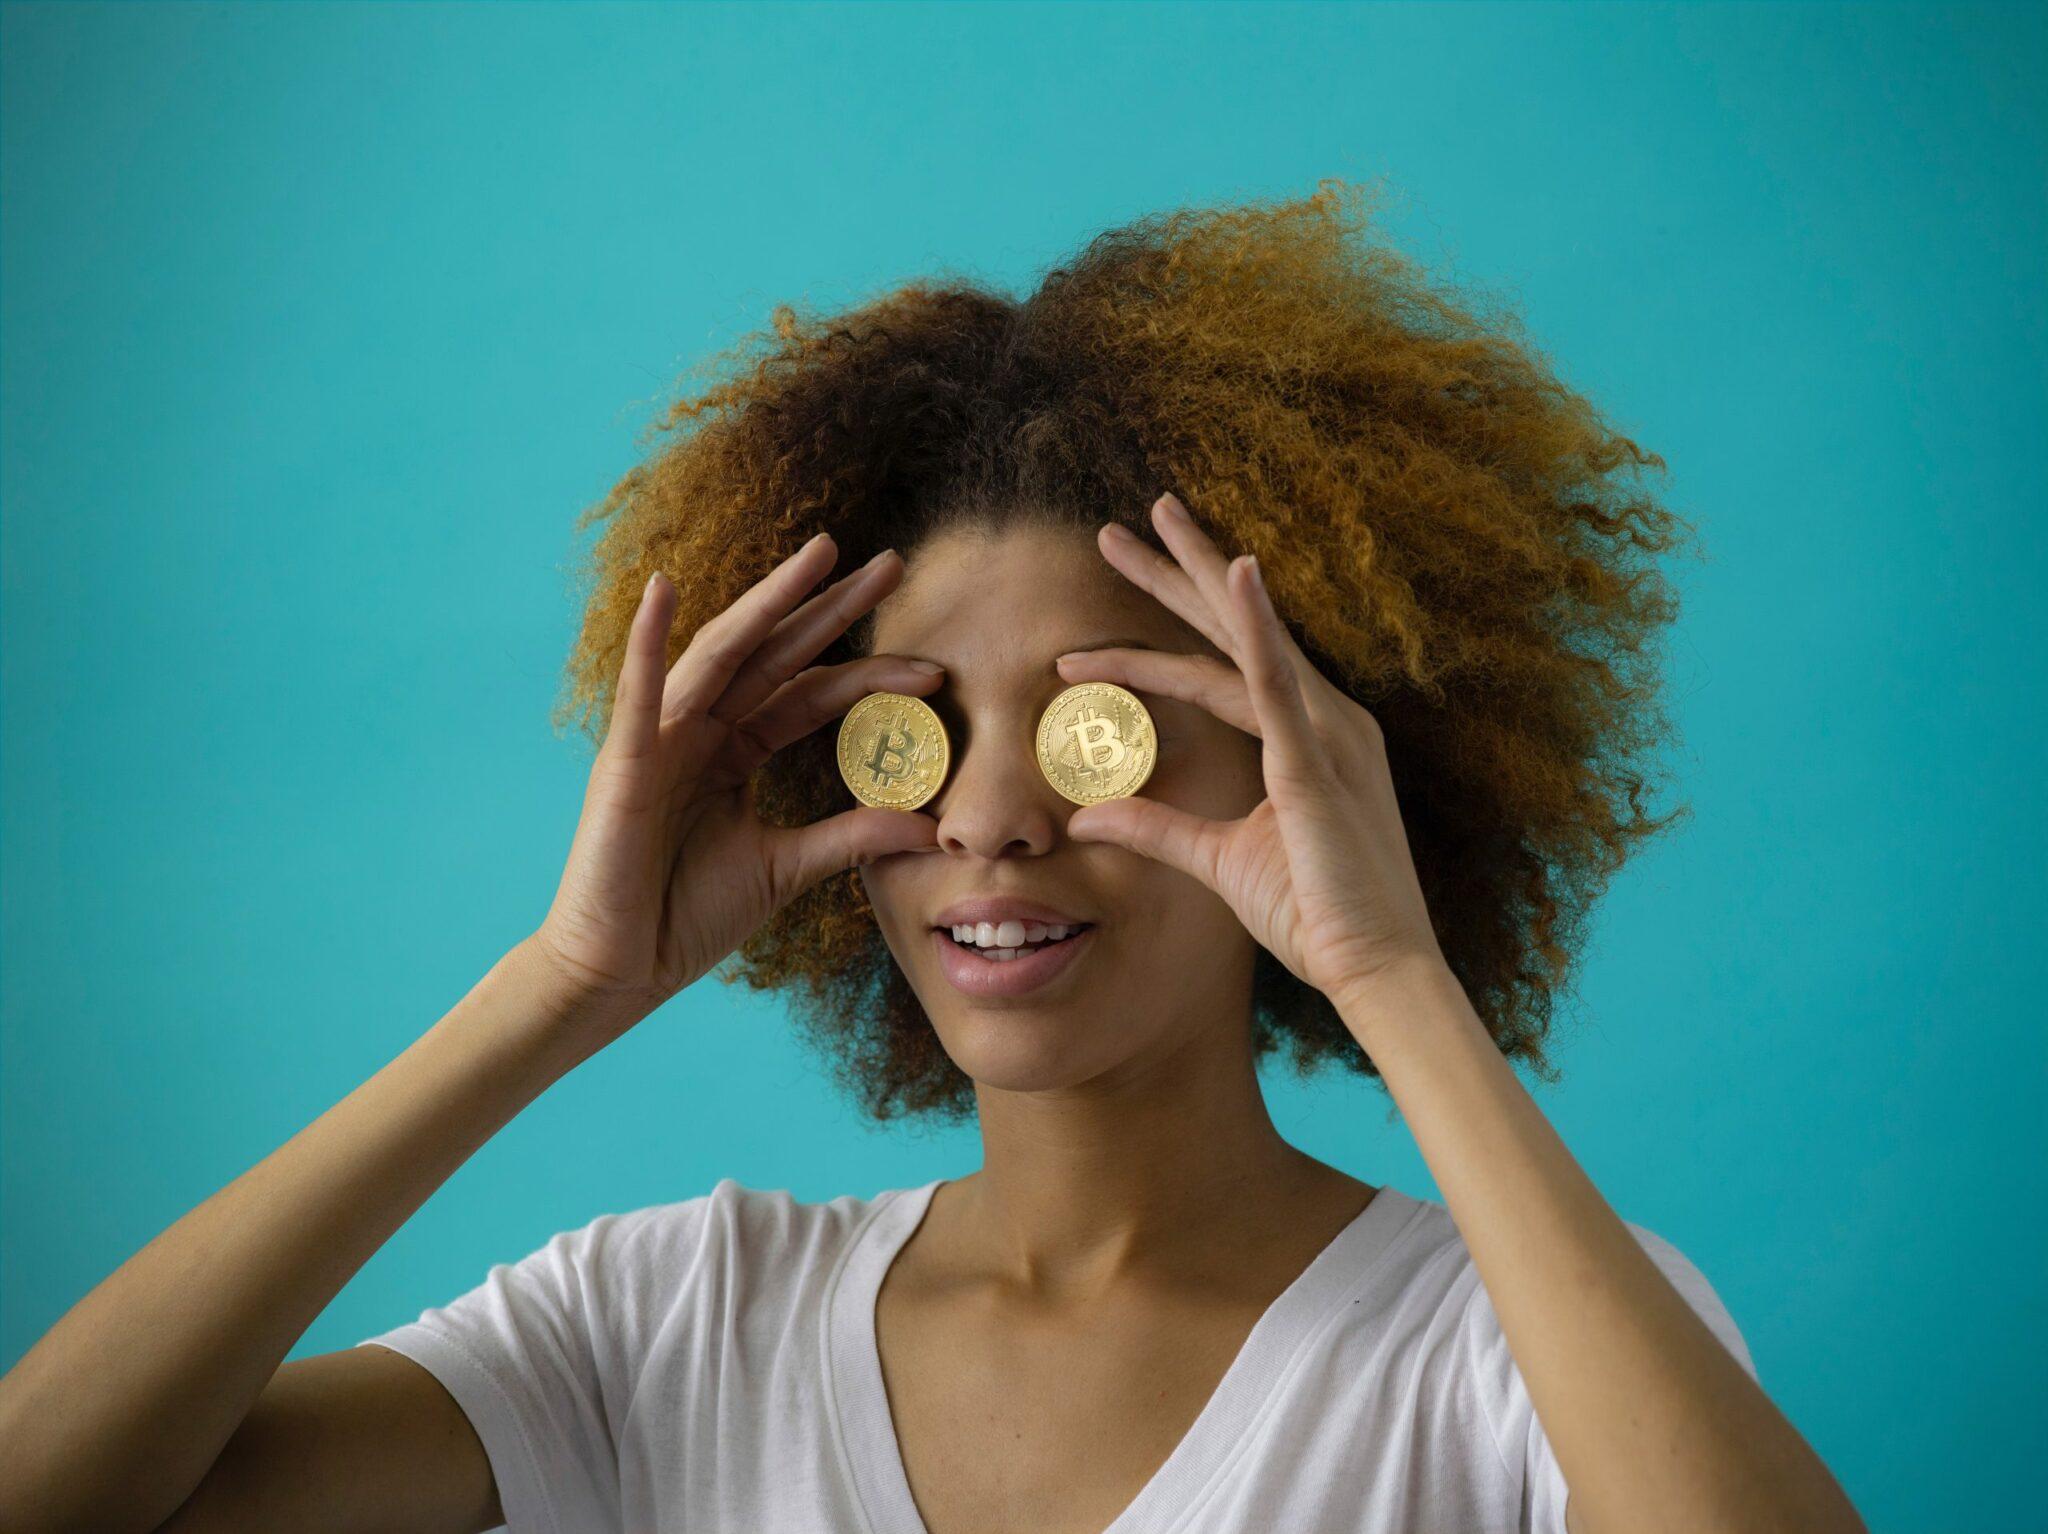 do women only want money?